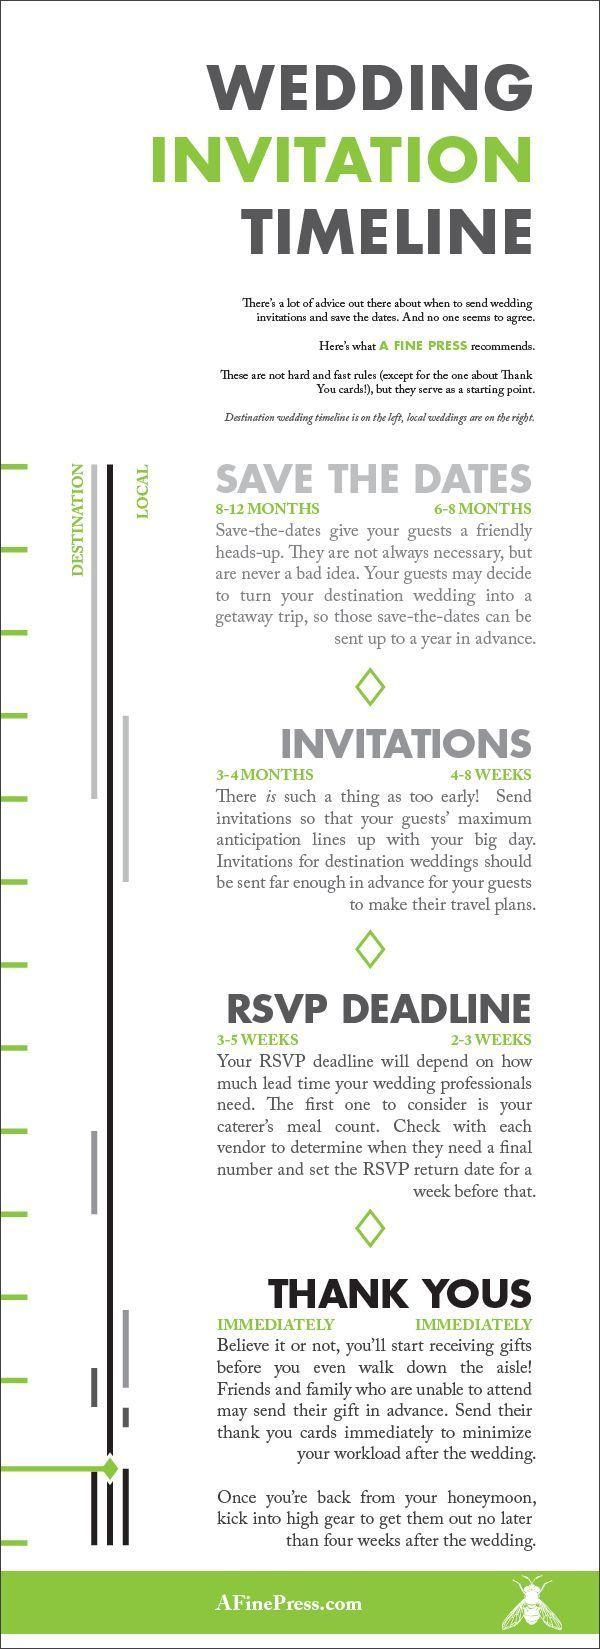 Dating Advice For Women Wedding timeline, Wedding